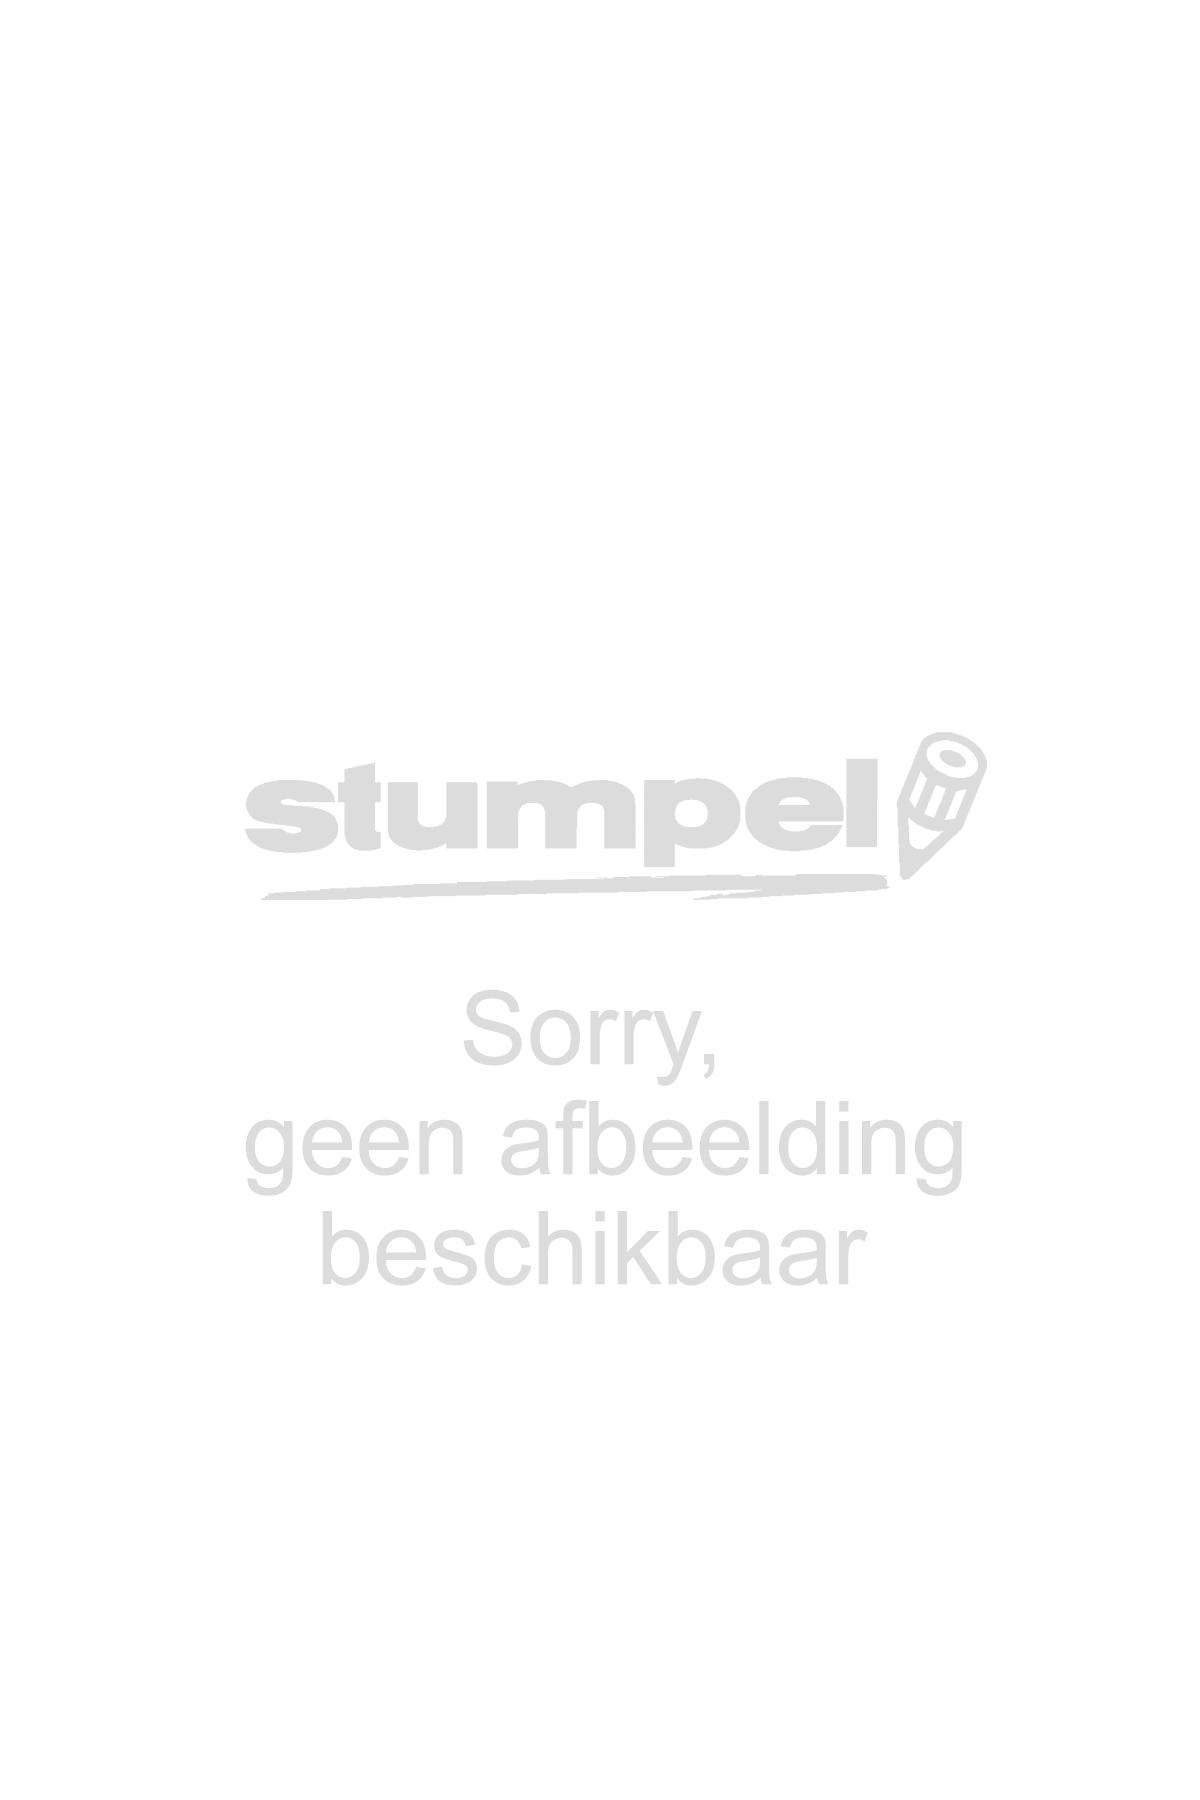 whiteboardstift-quantore-rond-1-1-5mm-zwart-630531